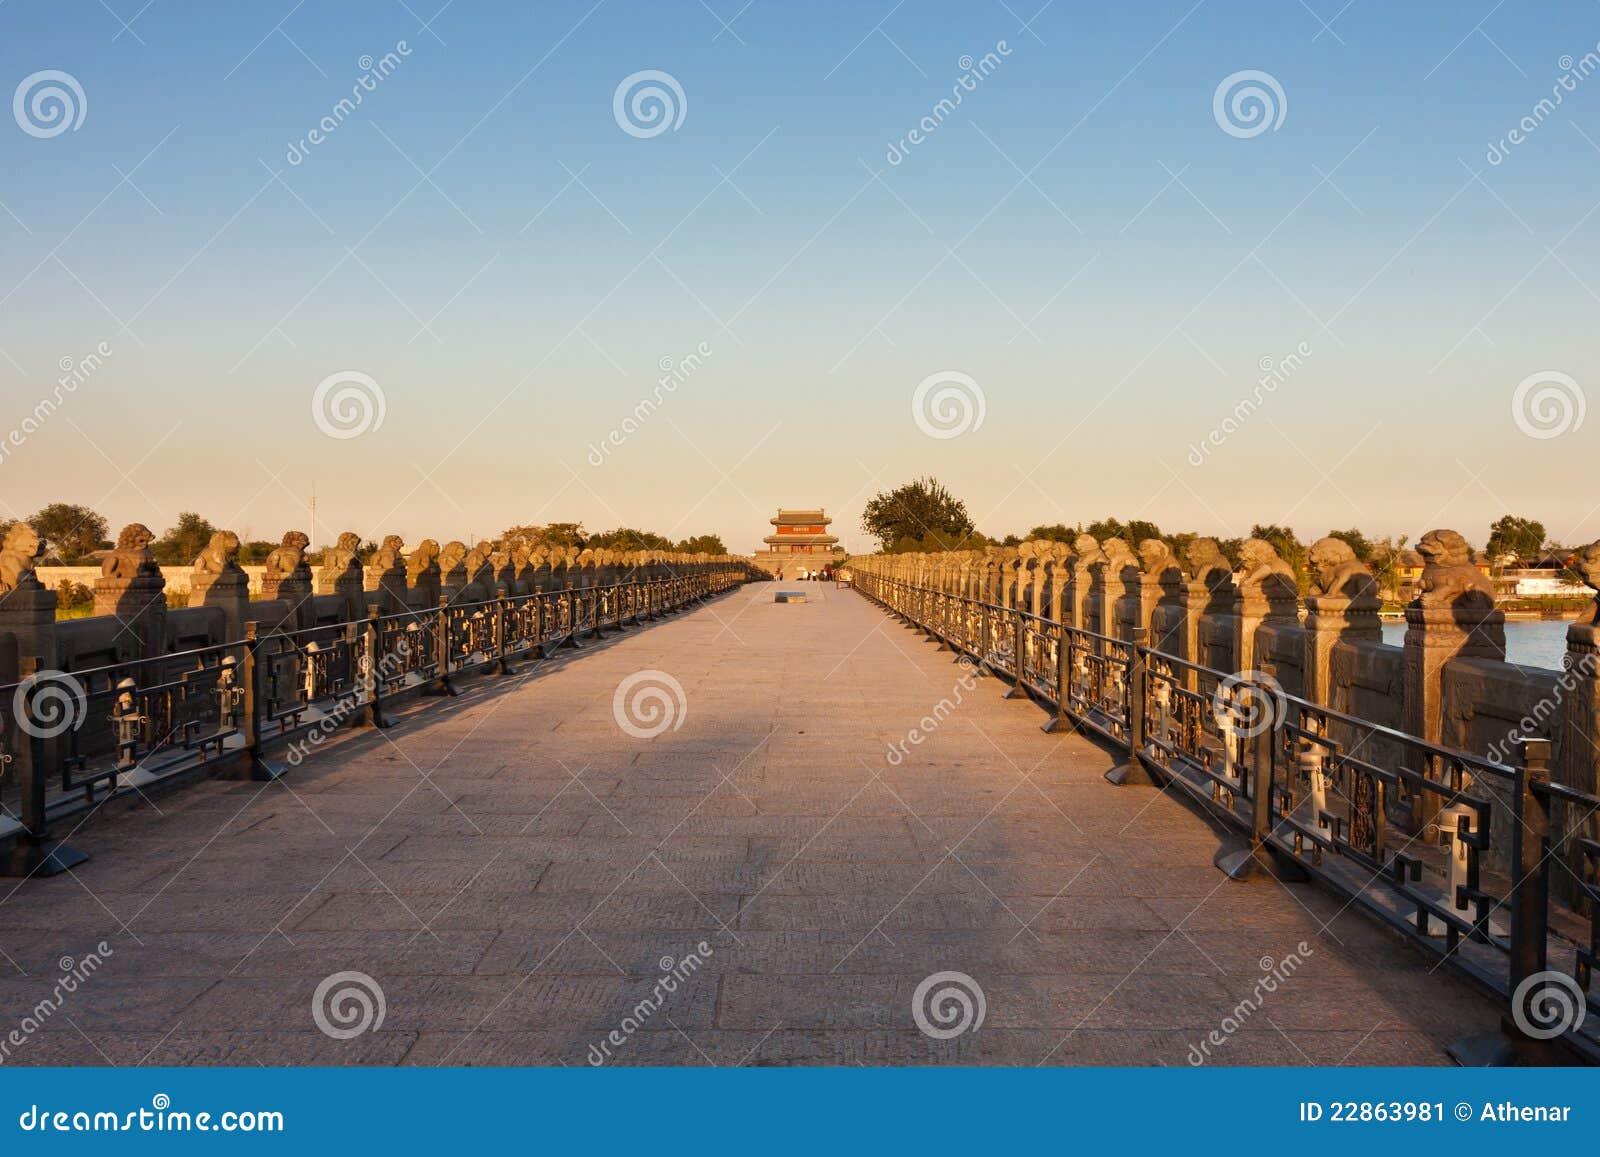 Ancient Lugou Bridge/Marco Polo Bridge, Beijing